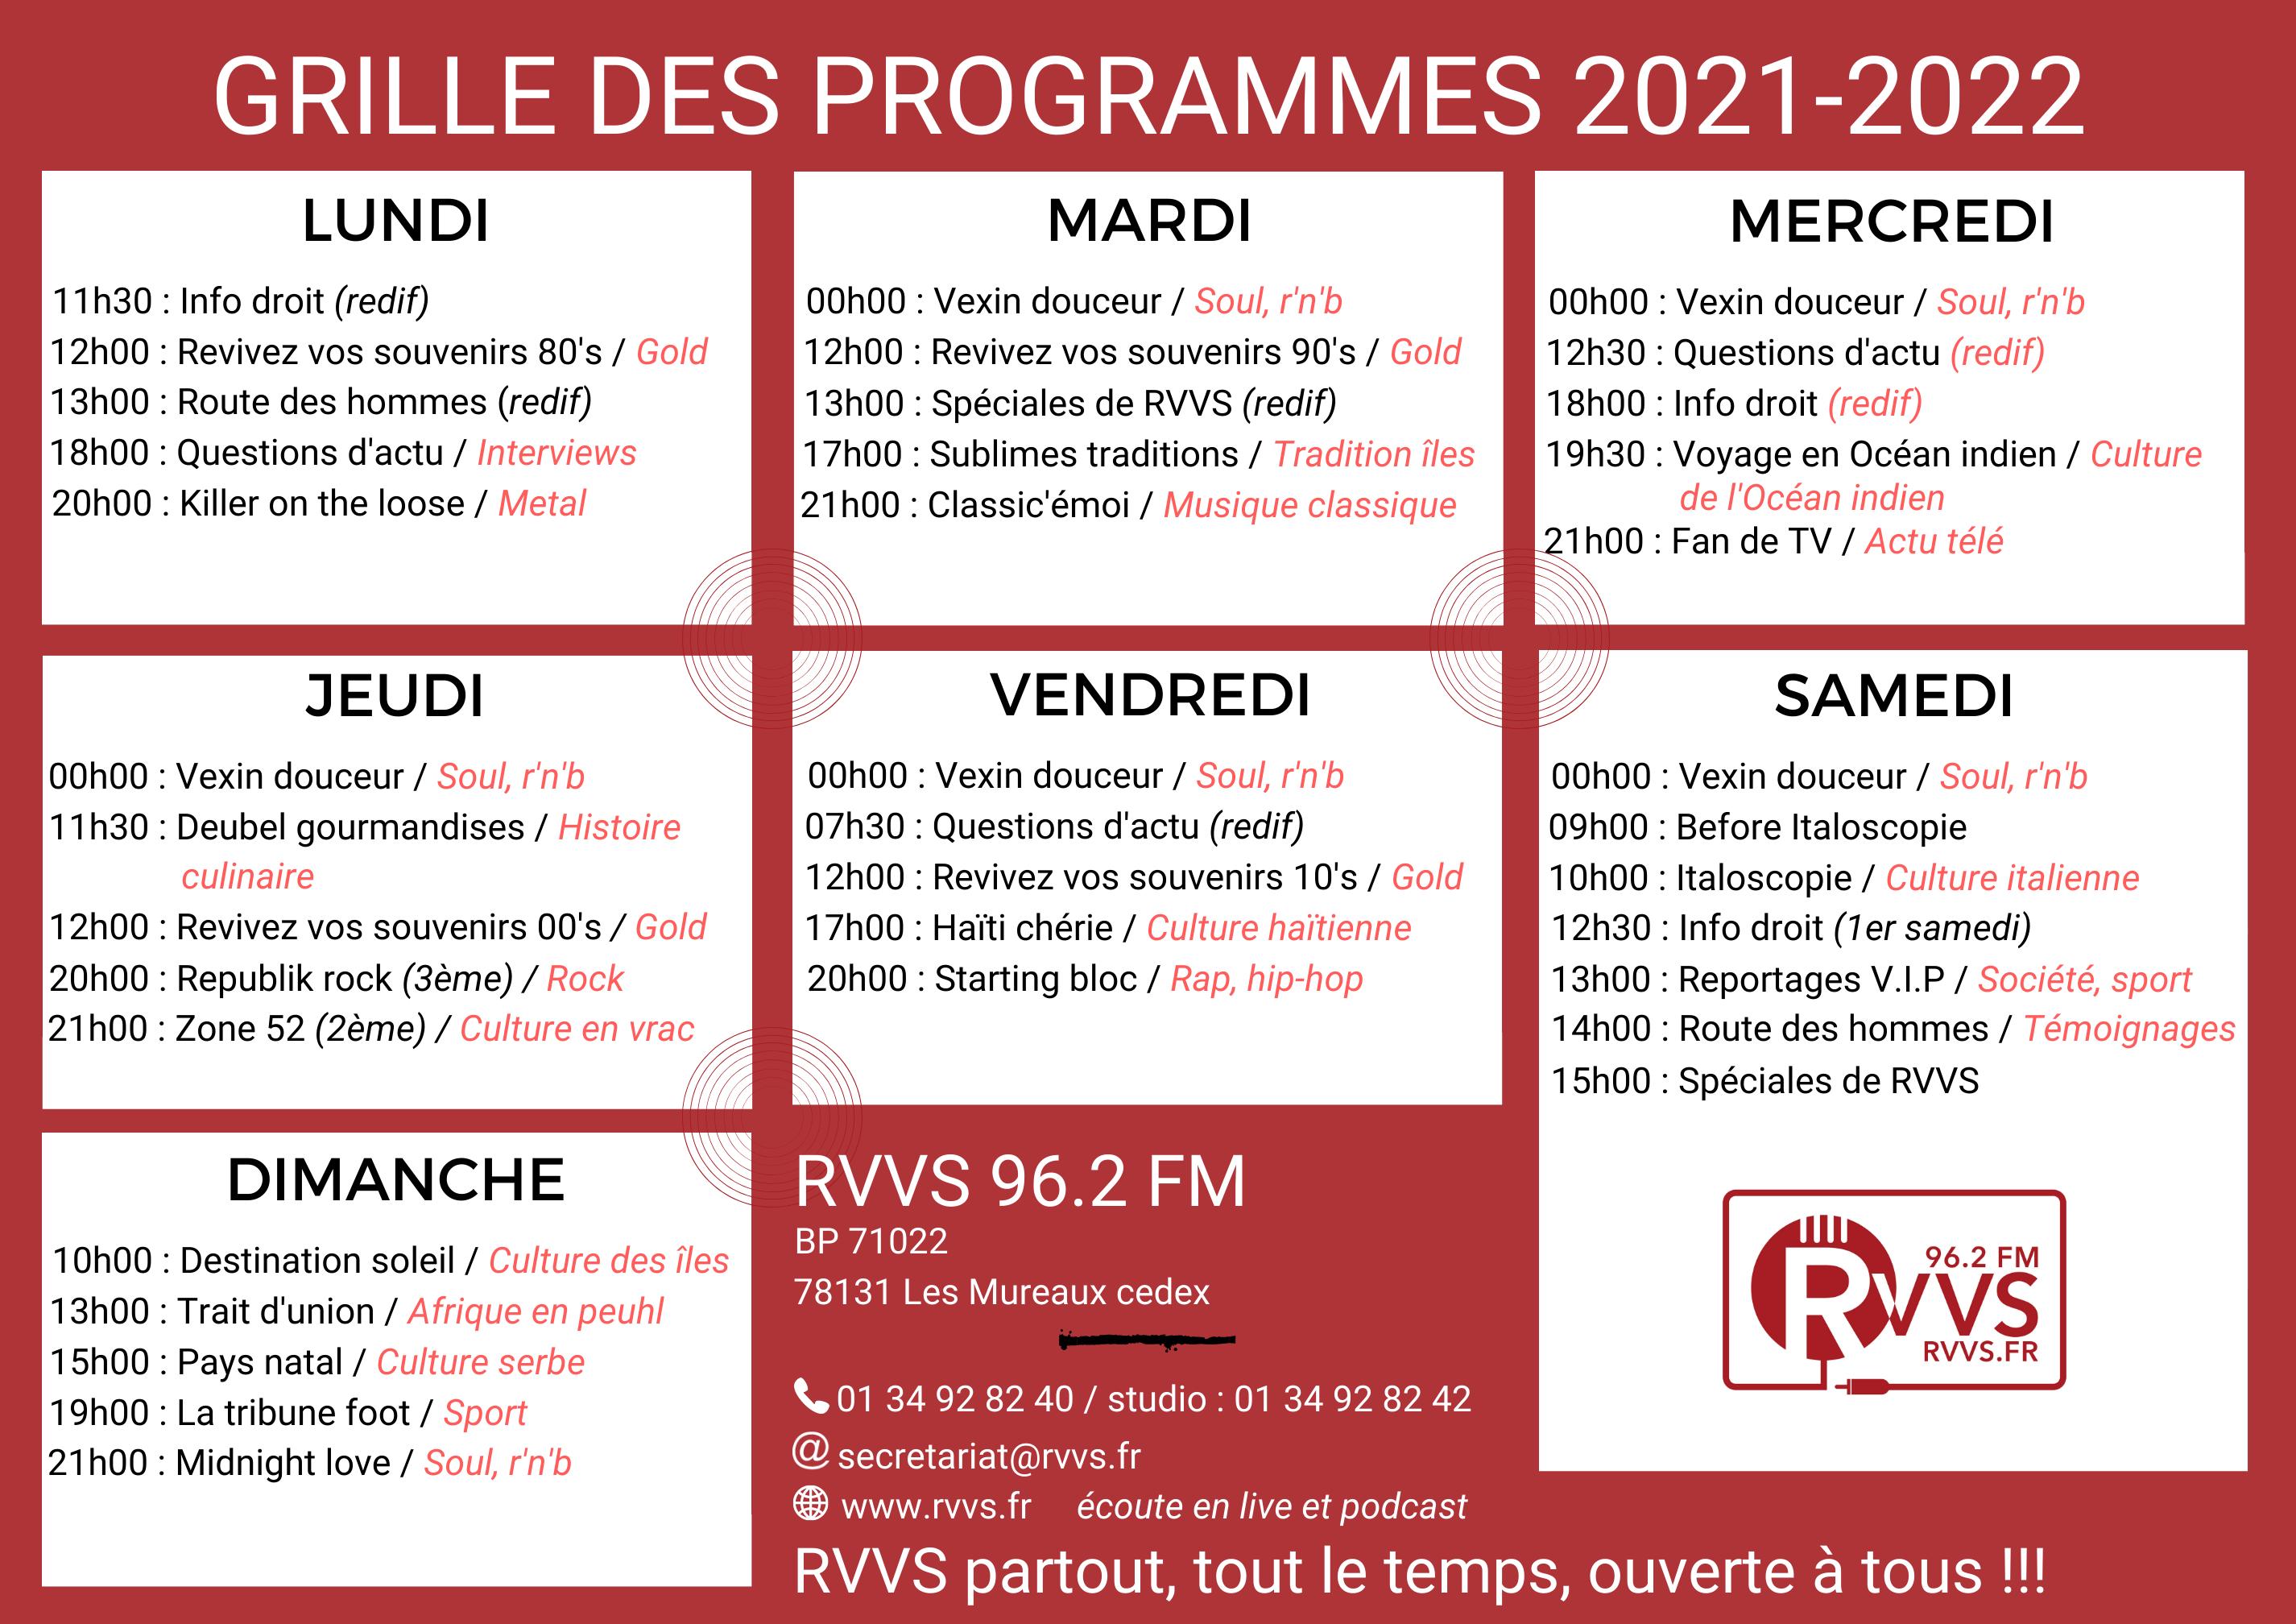 2021-2022 GRILLE DES PROGRAMMES horaires